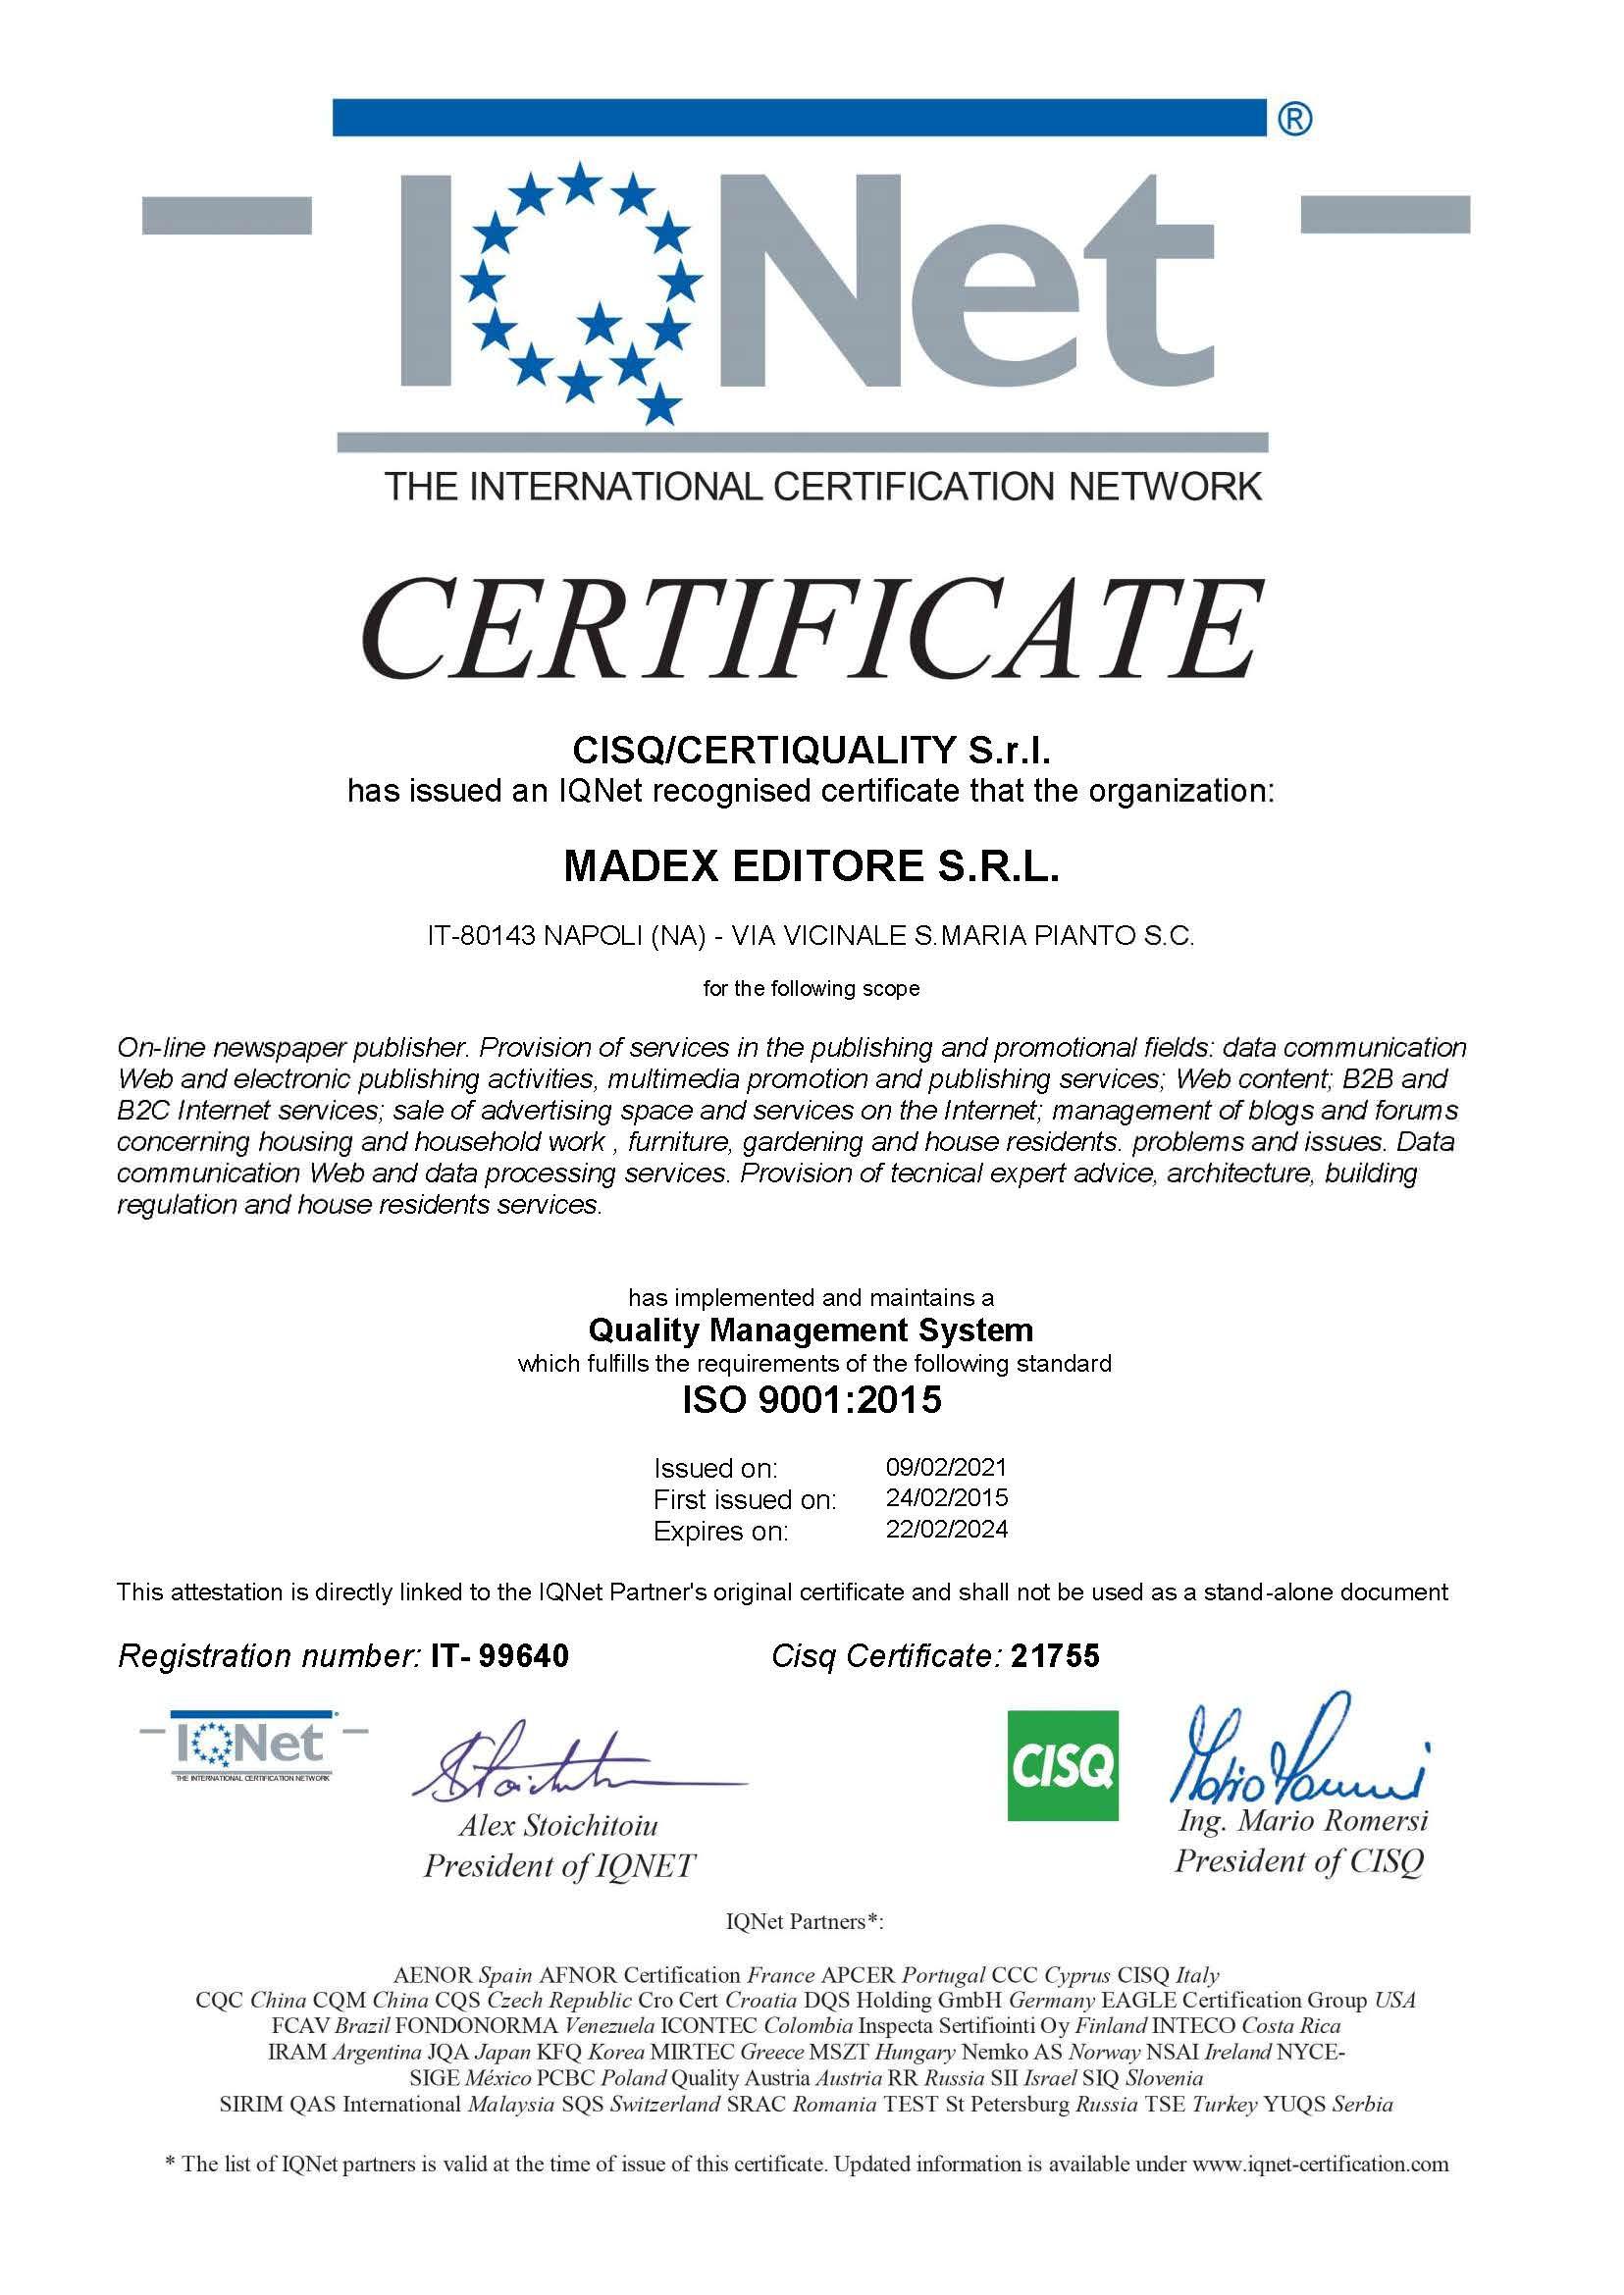 Certificato ISO 9001:2015 IQNET 2